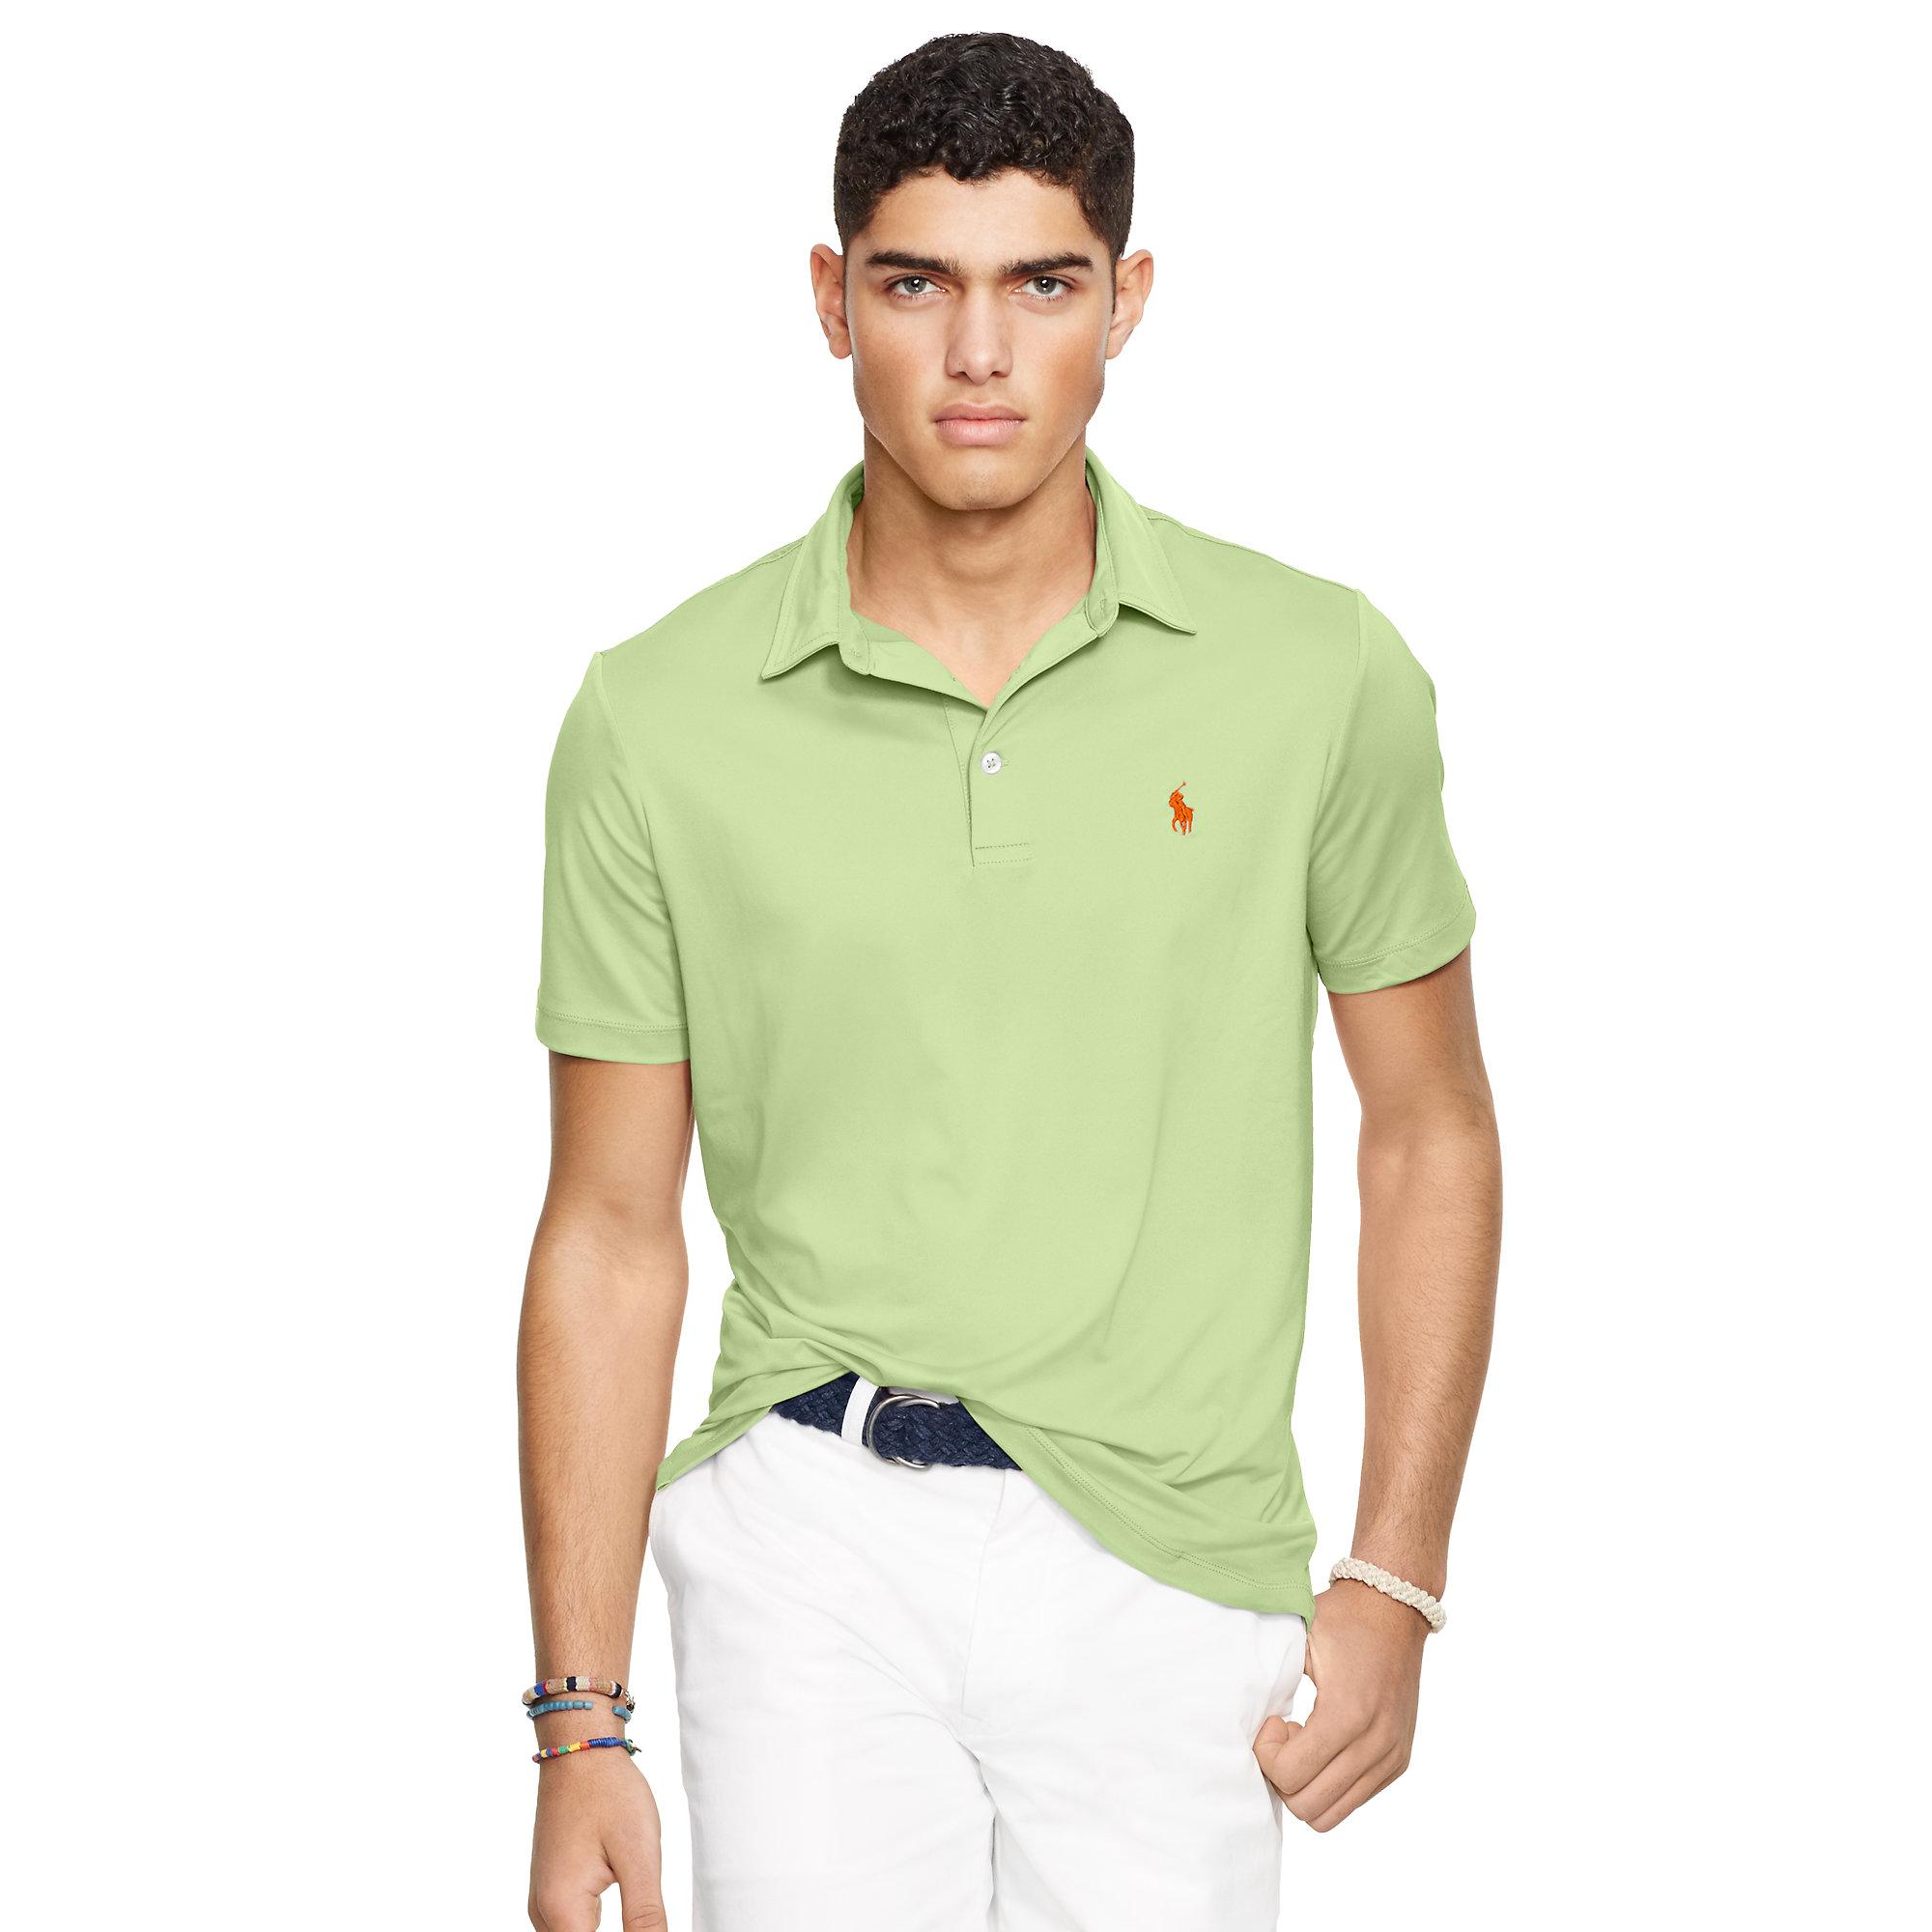 cbdeb3b17 Polo Ralph Lauren Custom-fit Performance Polo in Green for Men - Lyst